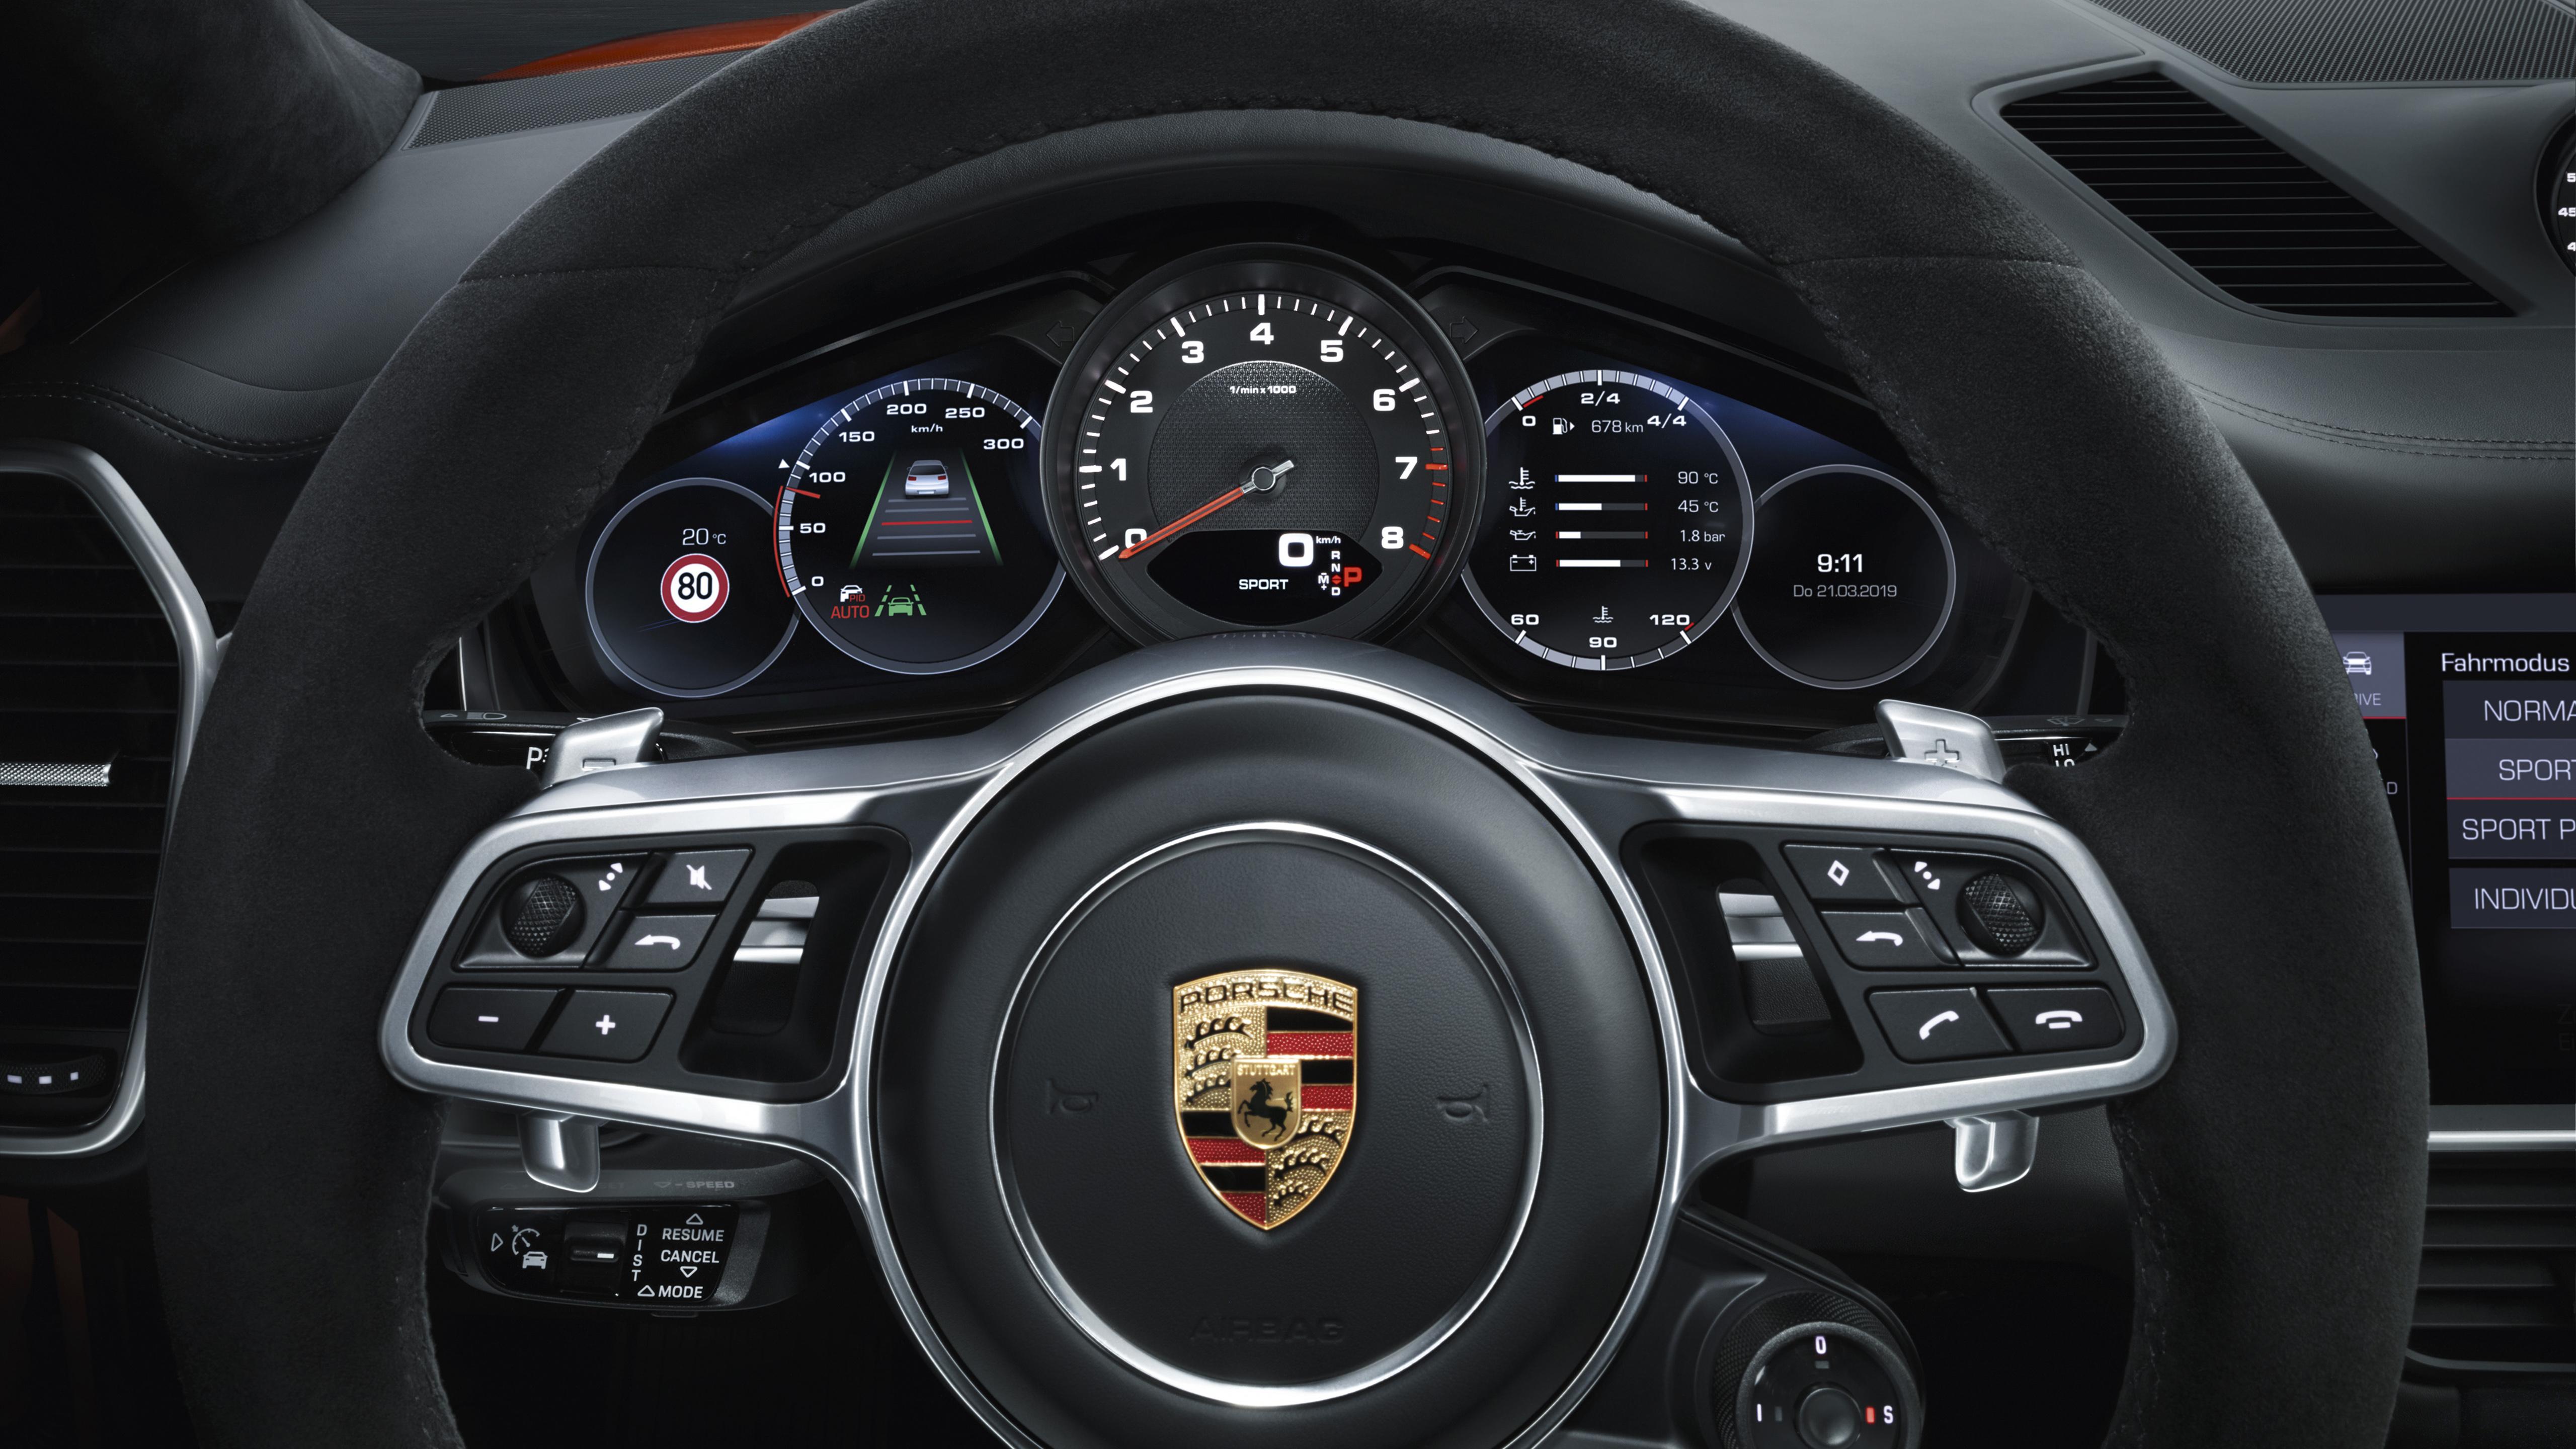 Porsche Cayenne Coupe 2019 Interior 4K Brick wallpaper hd 5120x2880